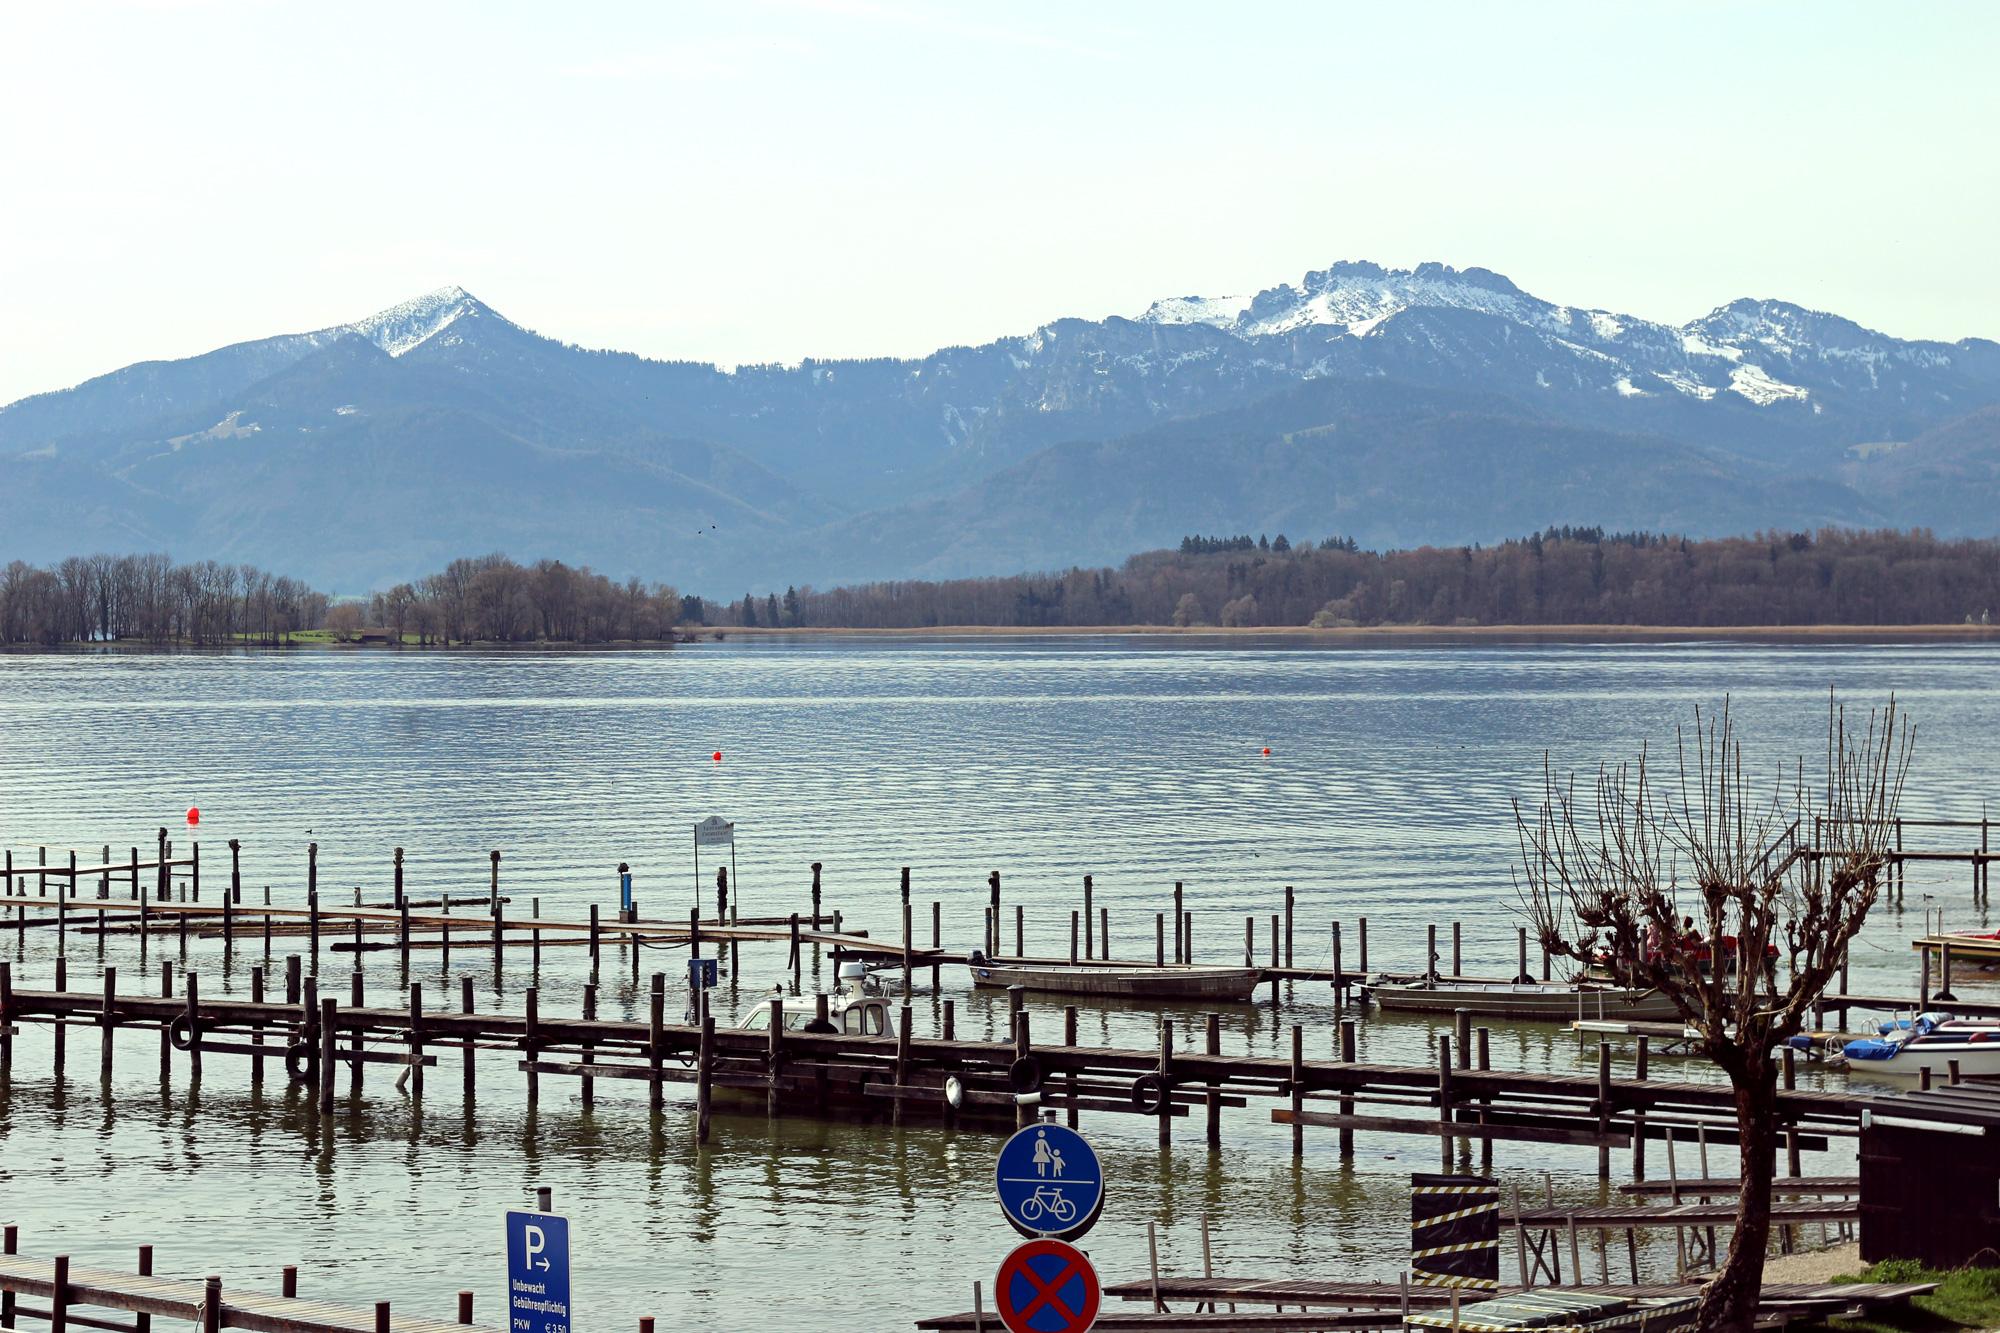 Cheimsee-lake-Bayern-weekend-escape-5